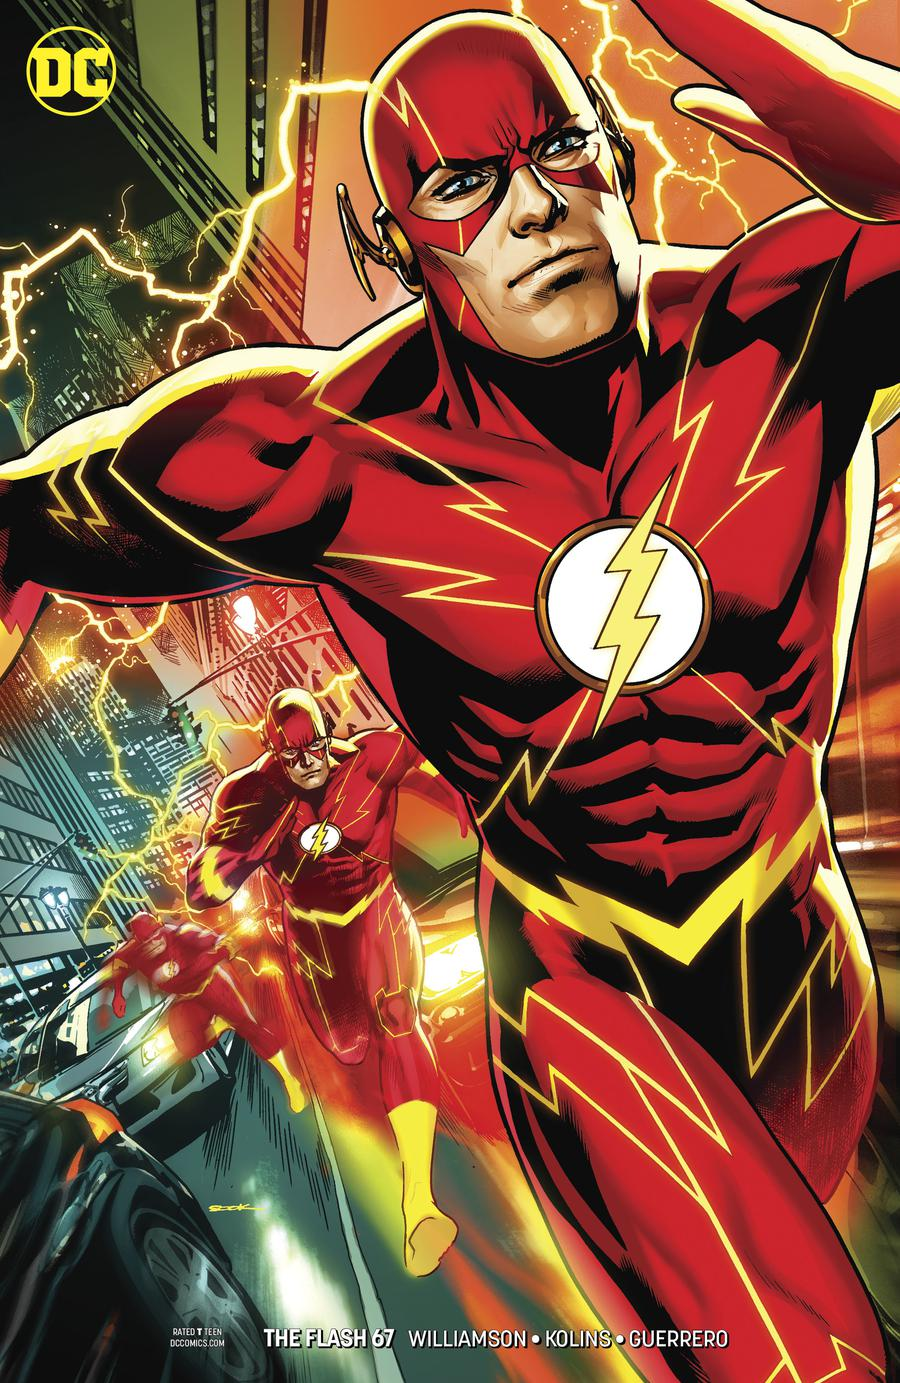 Flash Vol 5 #67 Cover B Variant Ryan Sook Cover